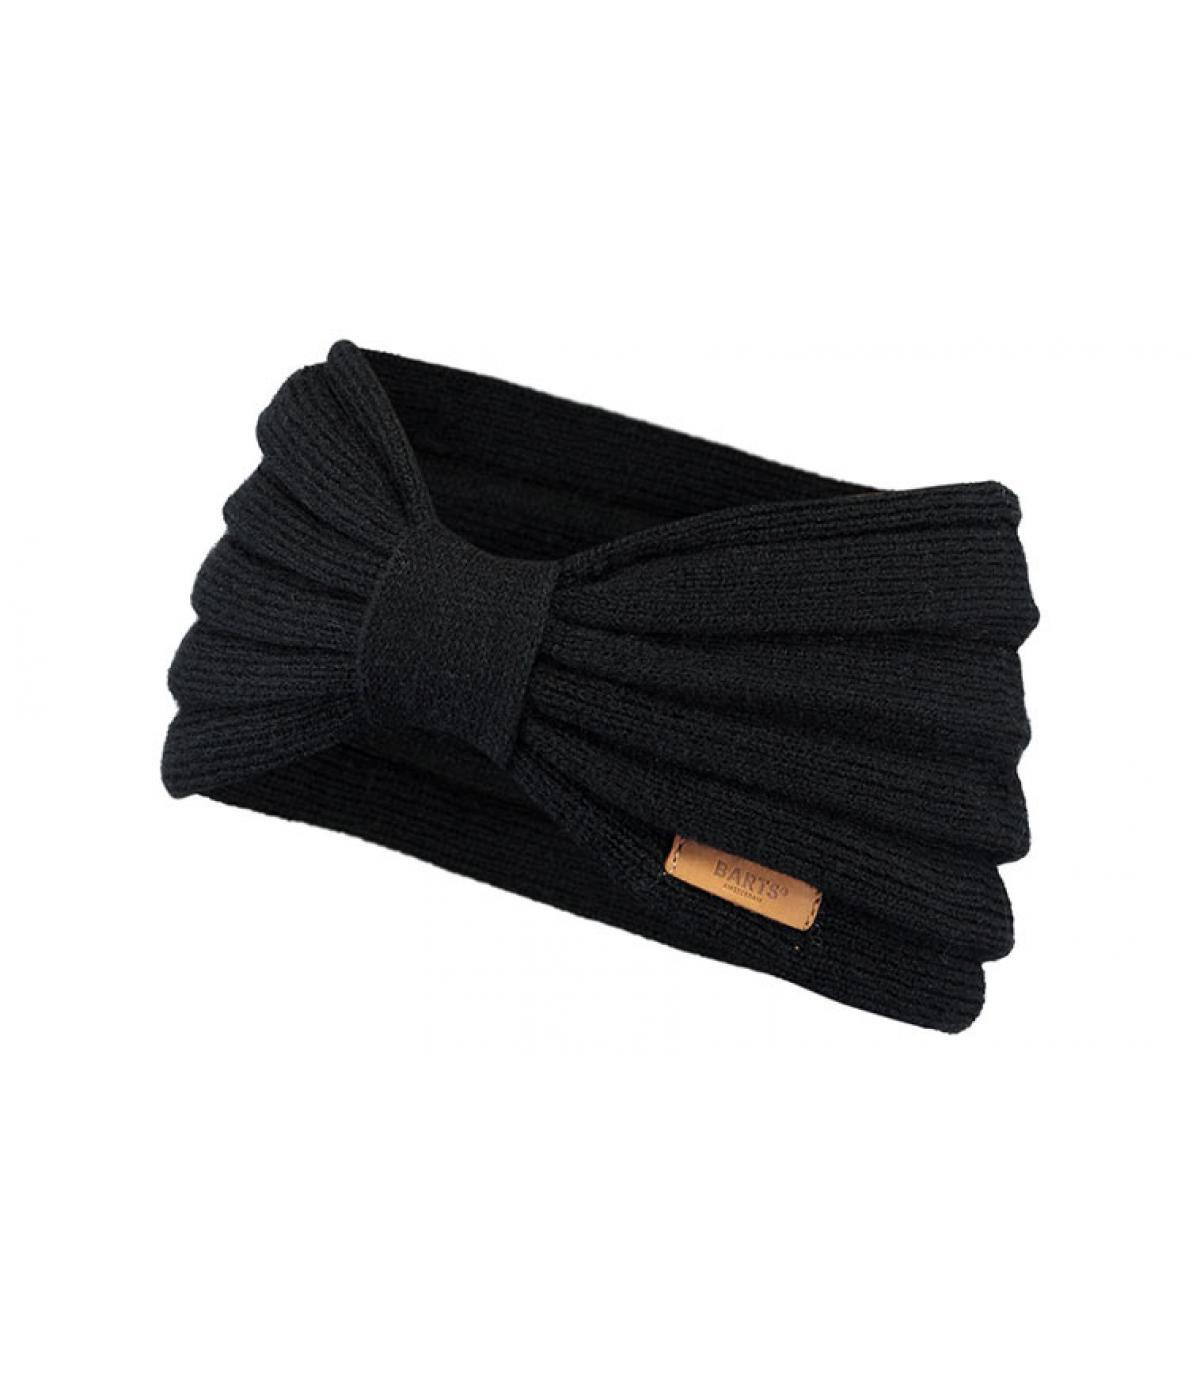 Détails Zitoun Headband black - image 2